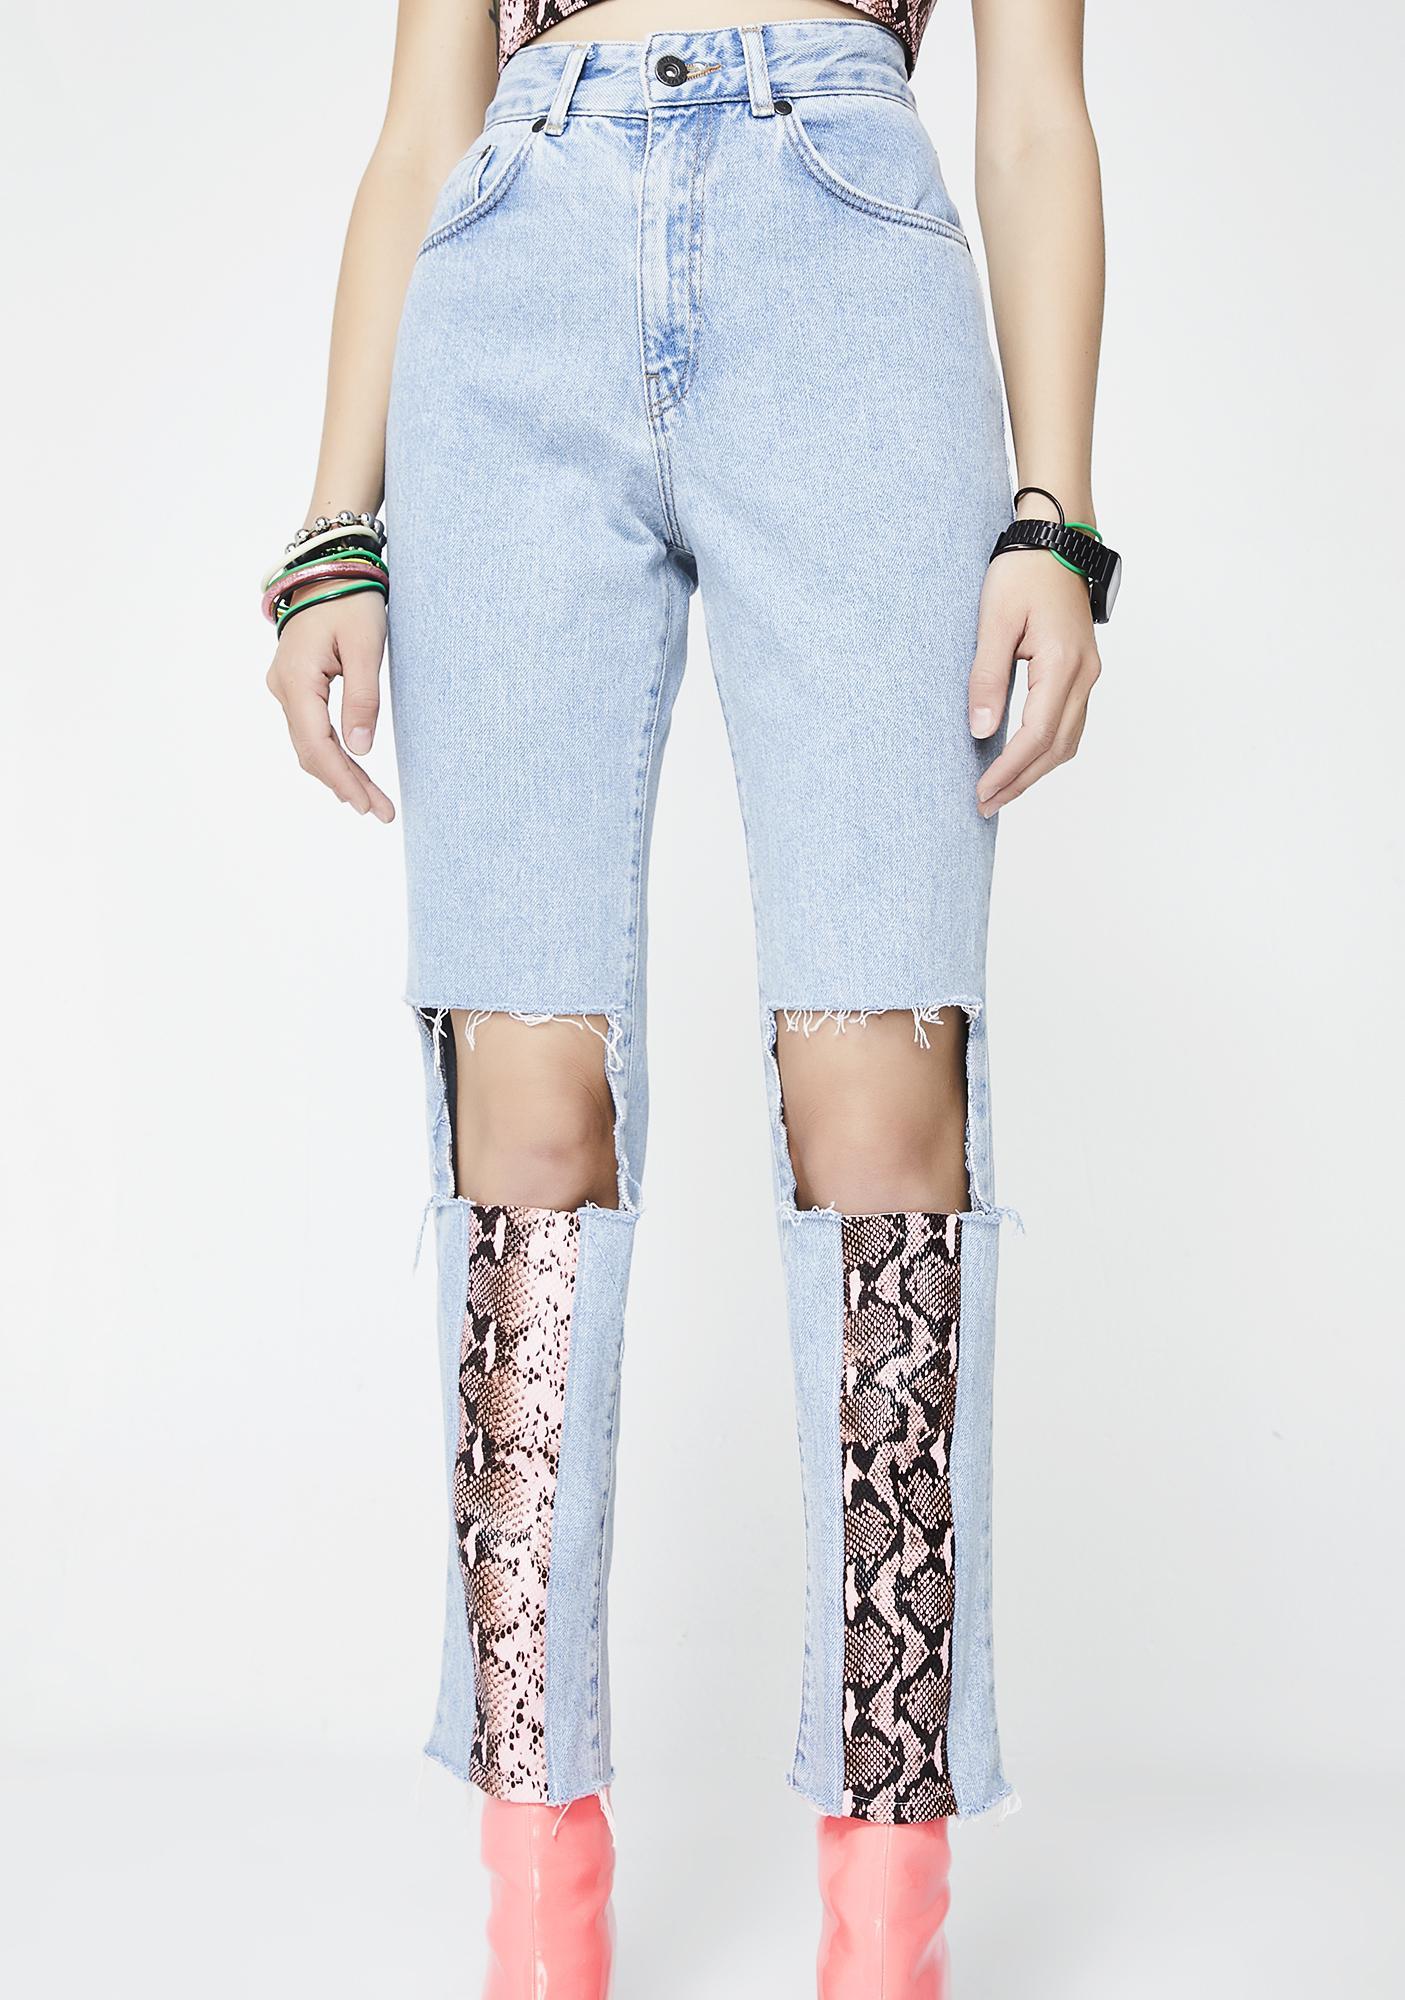 The Ragged Priest Cobra Jeans